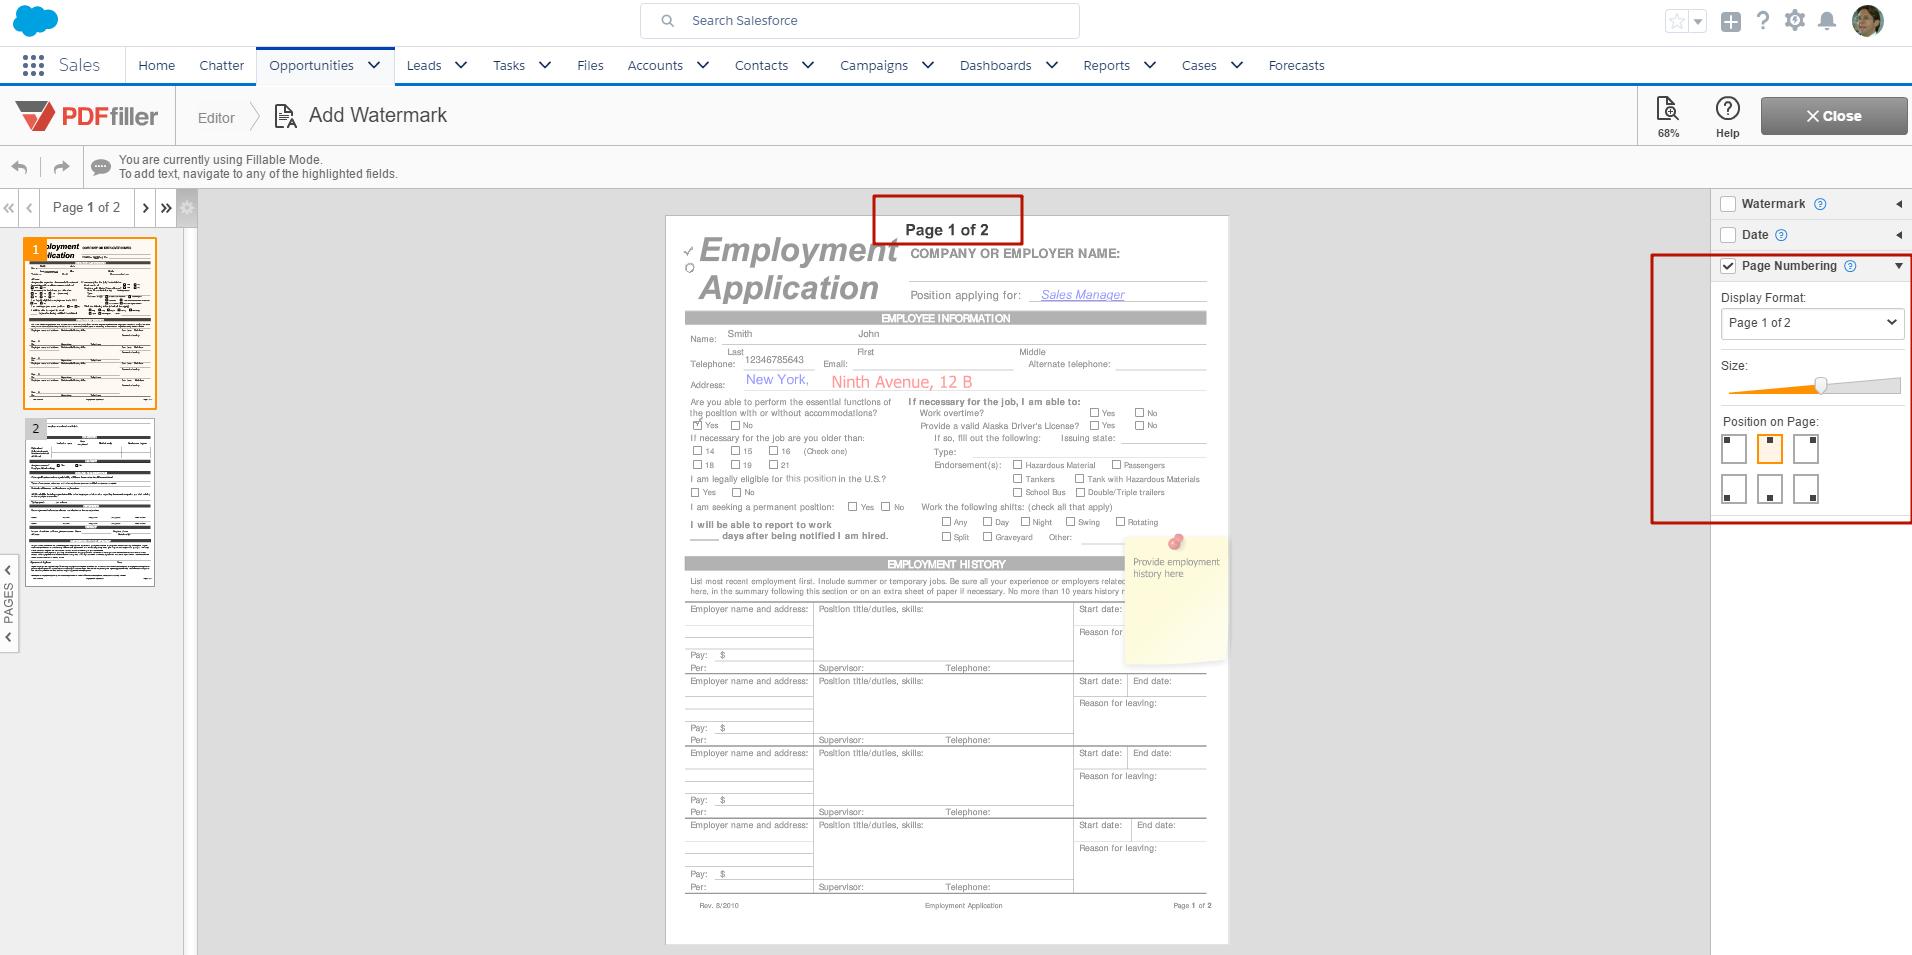 DaDaDocs for integration with Salesforce